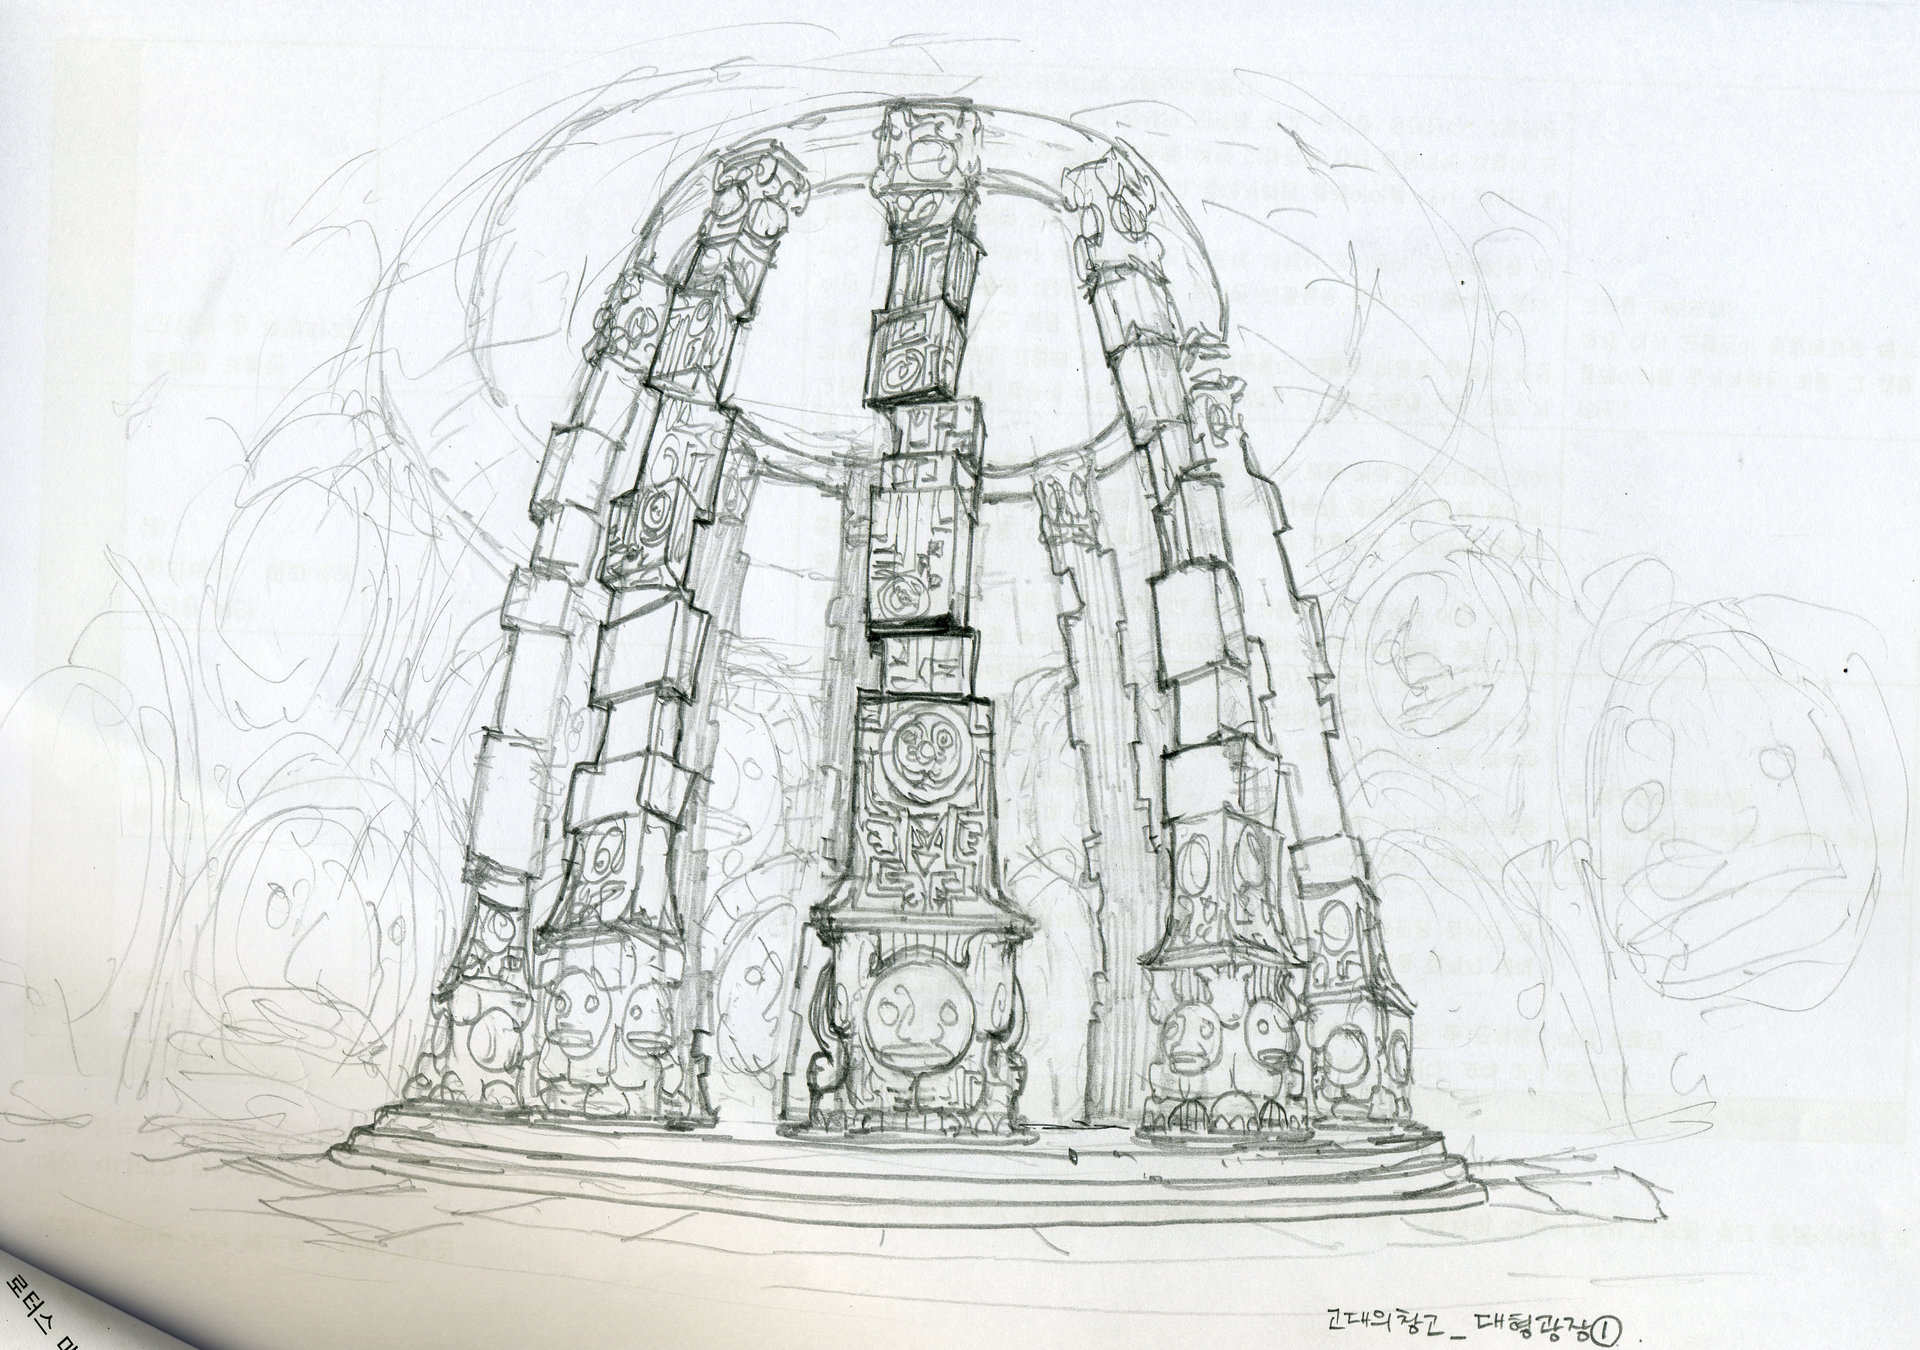 Seung chan lee bg ancient 18